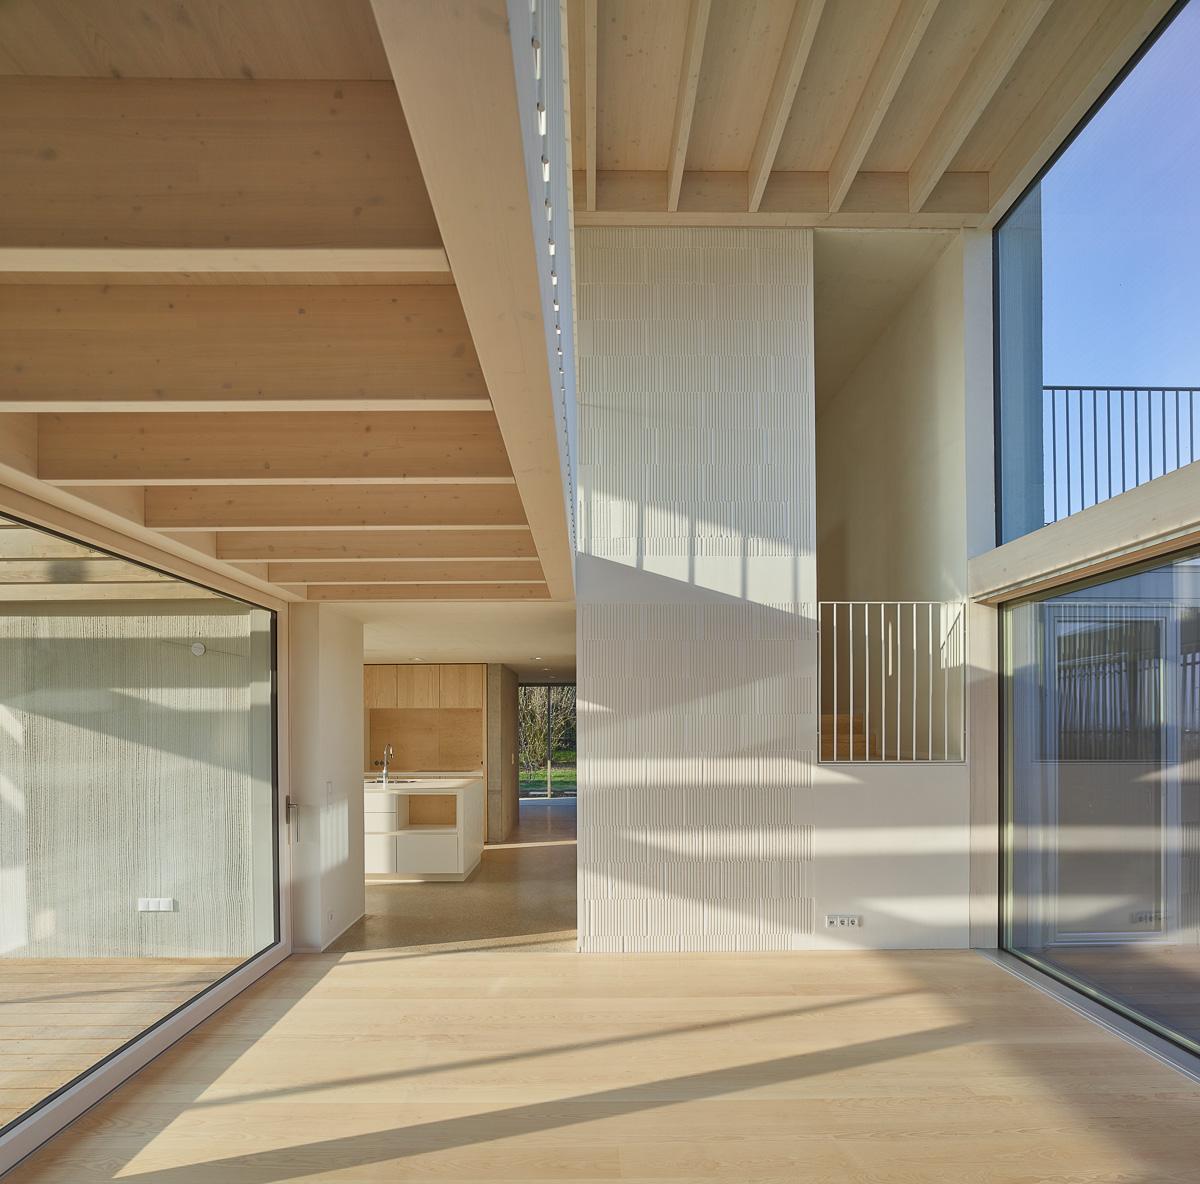 photography architecture by kurt hoerbst architekturfotografie mia2 architects. Black Bedroom Furniture Sets. Home Design Ideas